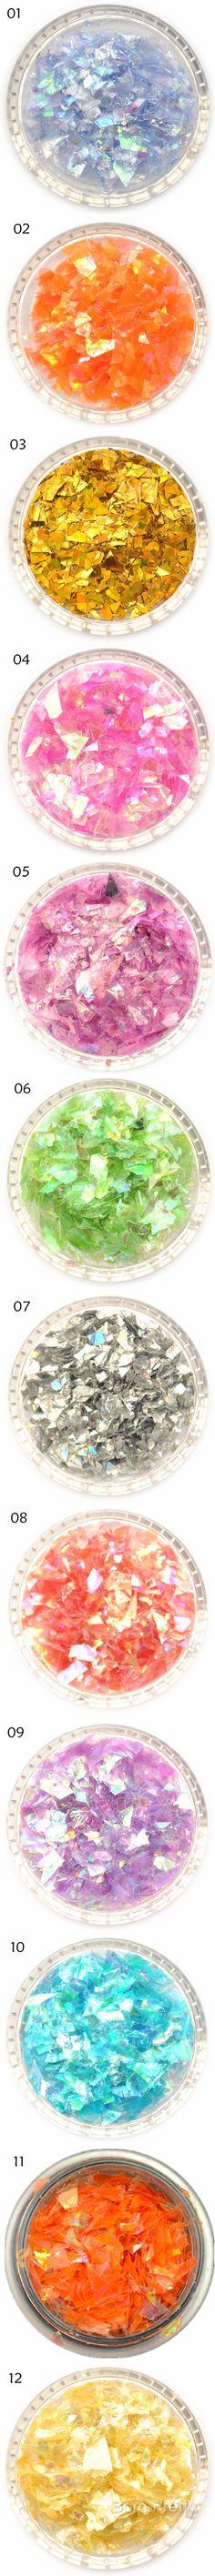 $1.59 1 Box Dazzling Nail Art Glitter Irregular Sweet Color Powder Sheets Tips Nail Art Decoration - BornPrettyStore.com